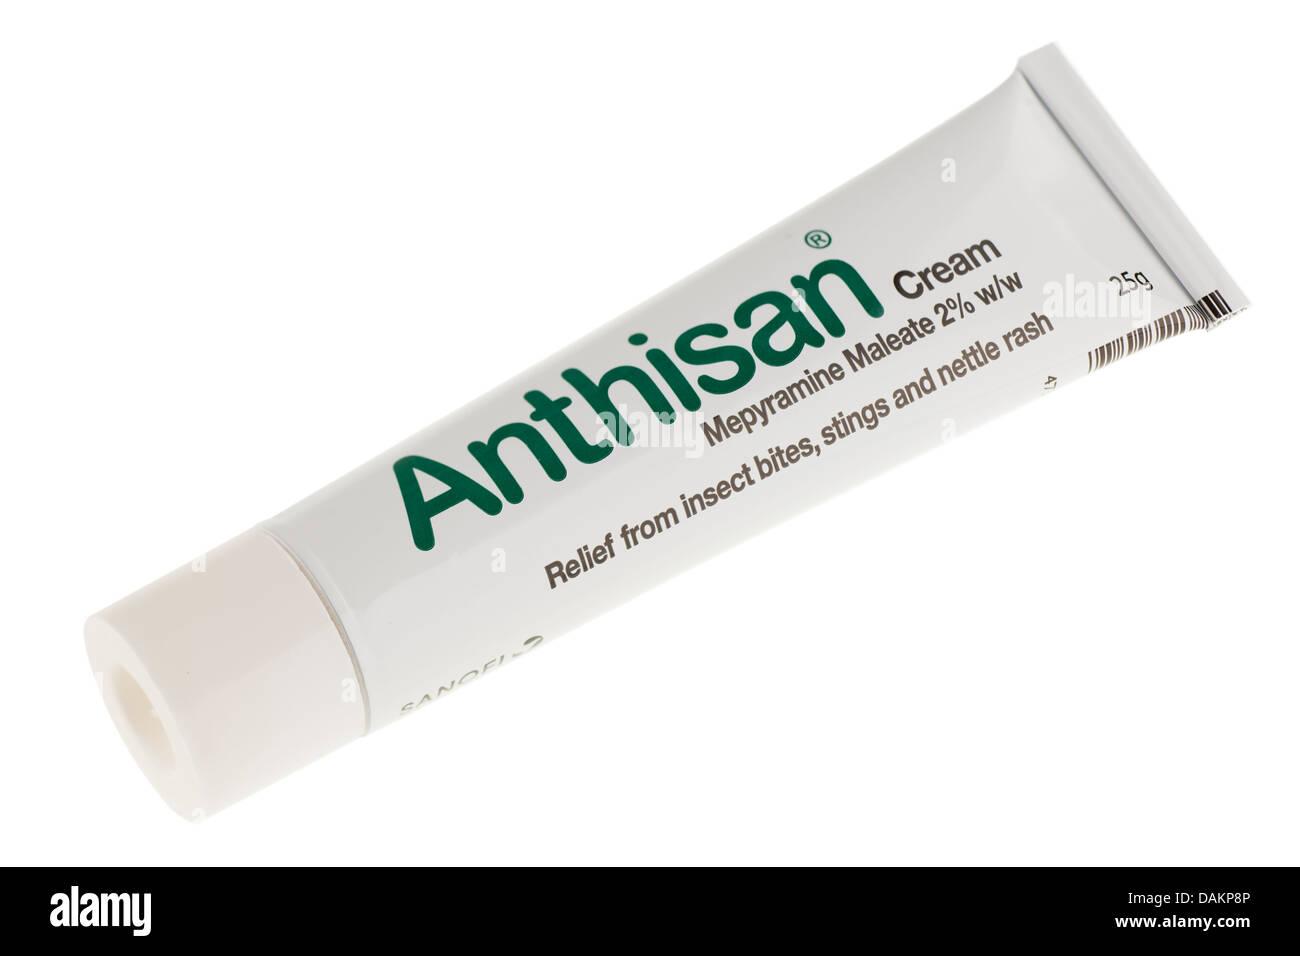 Antihistamine Stock Photos & Antihistamine Stock Images - Alamy